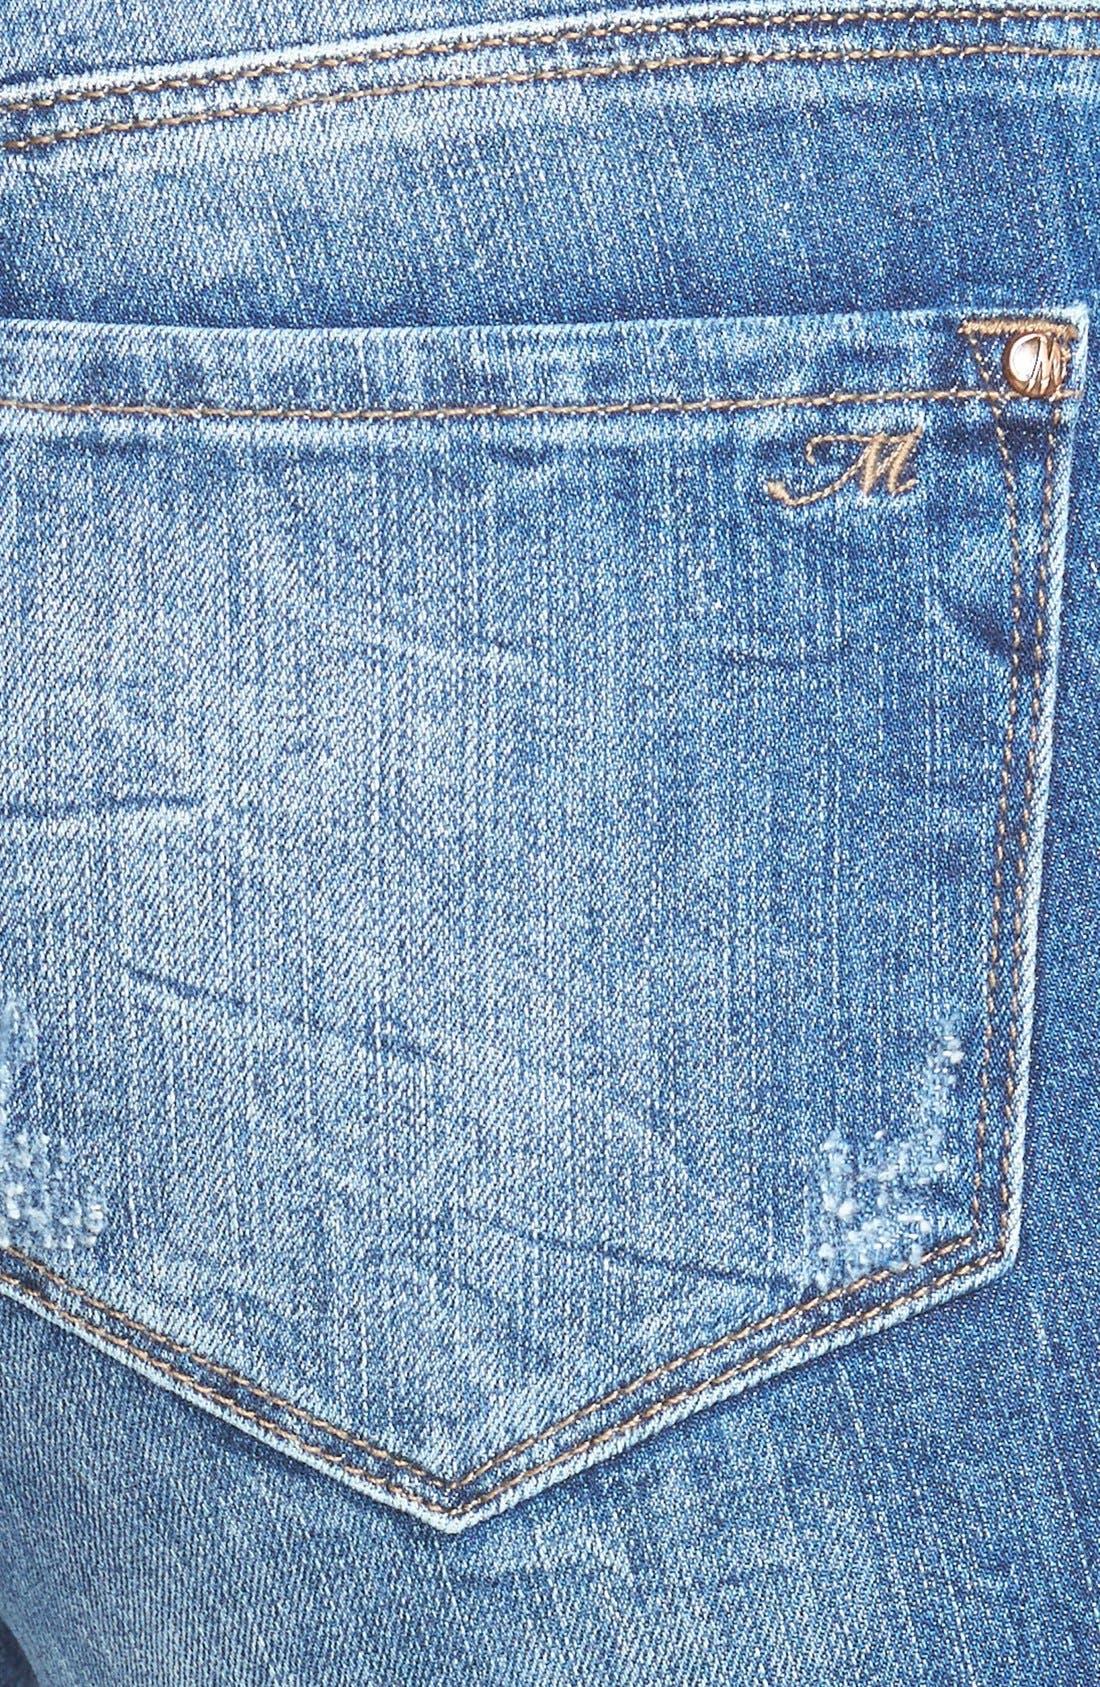 Alternate Image 3  - Mavi Jeans 'Alexa' Distressed Stretch Skinny Jeans (Mid Patched Vintage)